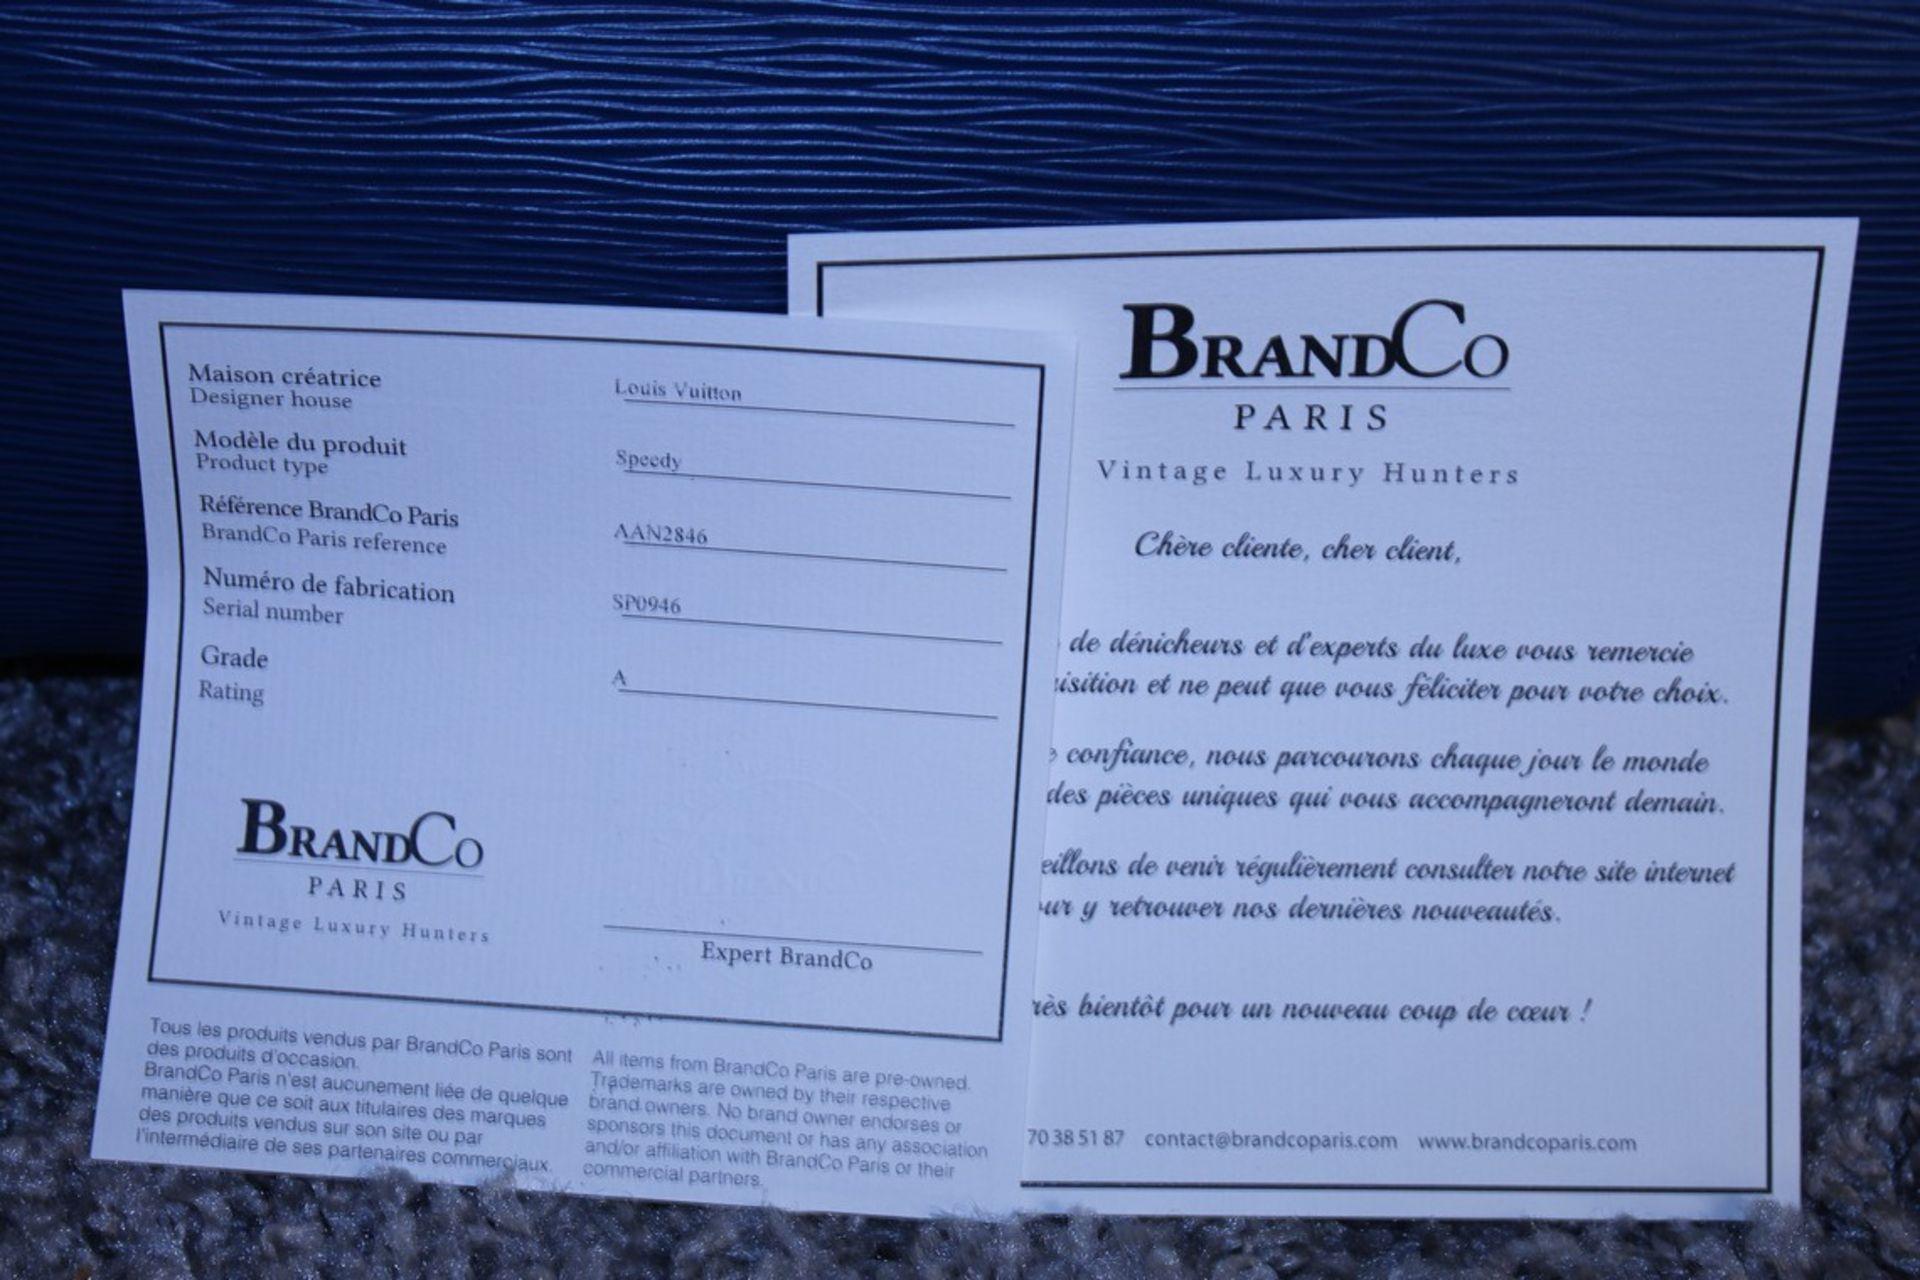 RRP £1,000 Louis Vuitton Speedy 25 Handbag, Blue Epi Calf Leather, 27X19X15Cm (Production Code - Image 5 of 5